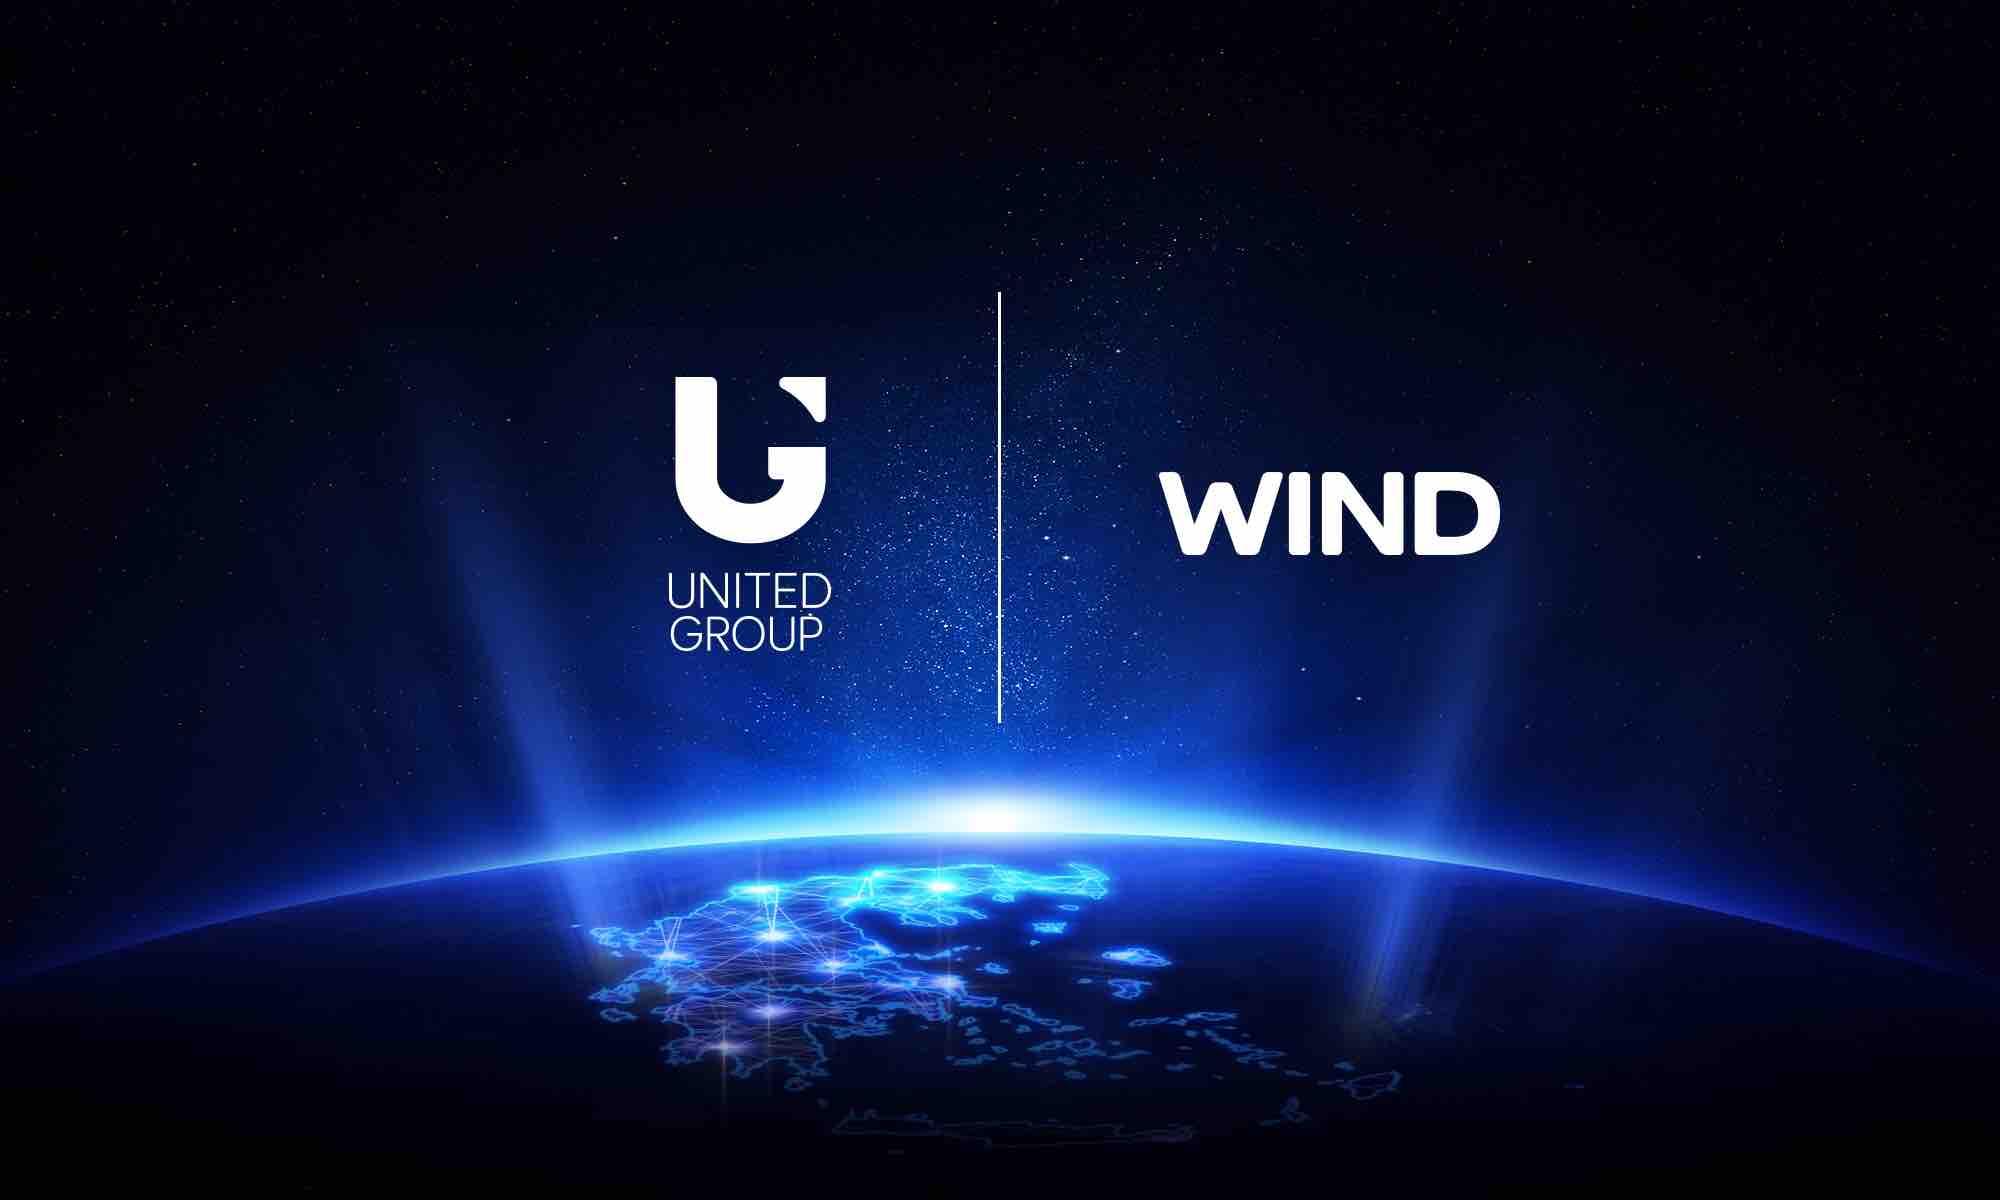 United Group: Ποια είναι η εταιρεία που εξαγόρασε την Wind Hellas και τα σχέδια για Nova